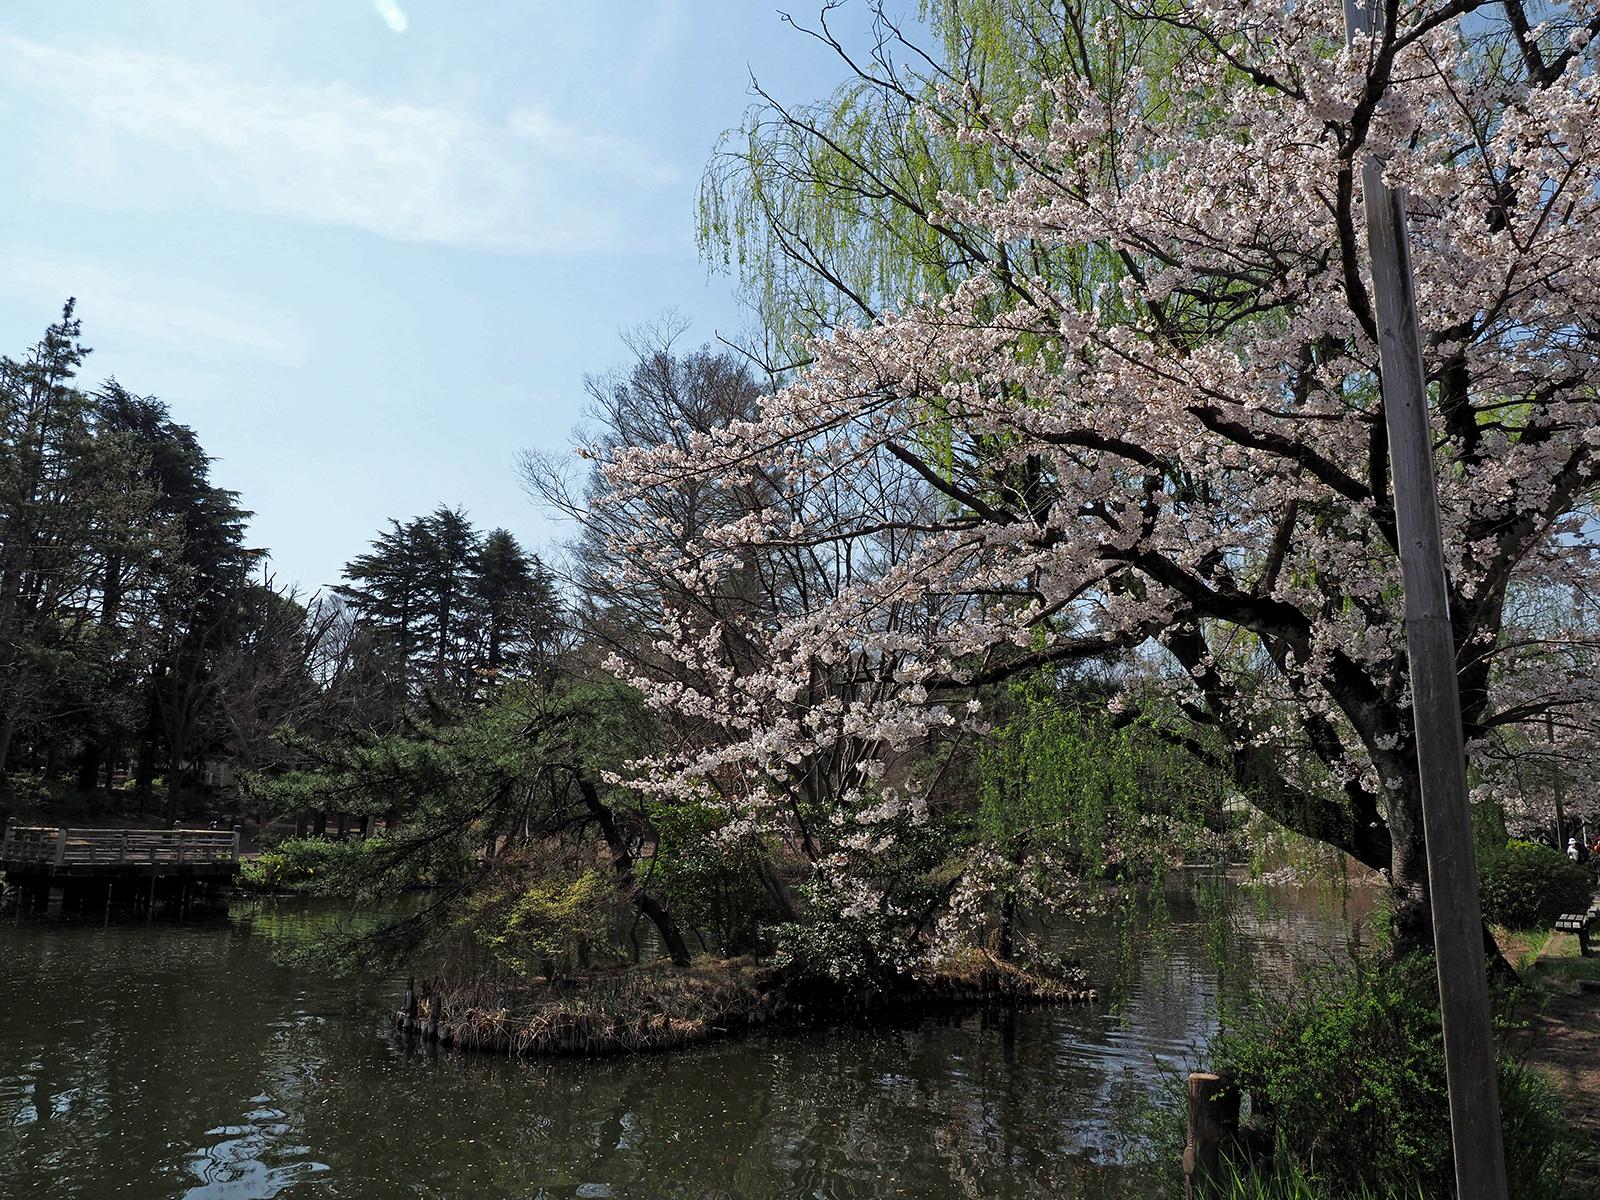 【OLYMPUS】OM-D E-M1 Mark IIで撮り歩き in 石神井公園~桜編